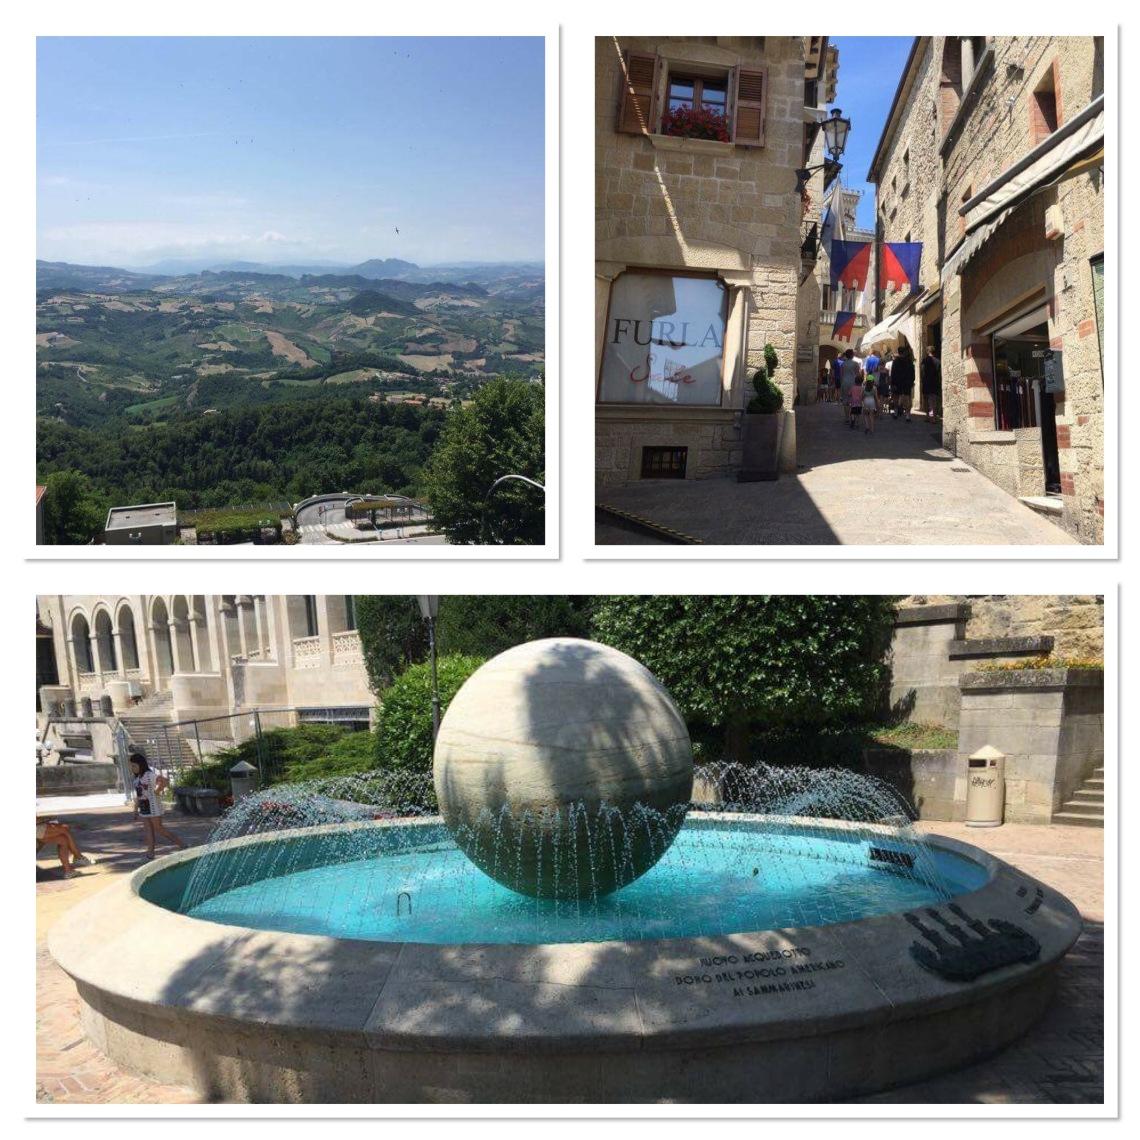 San Marino is a beautiful country